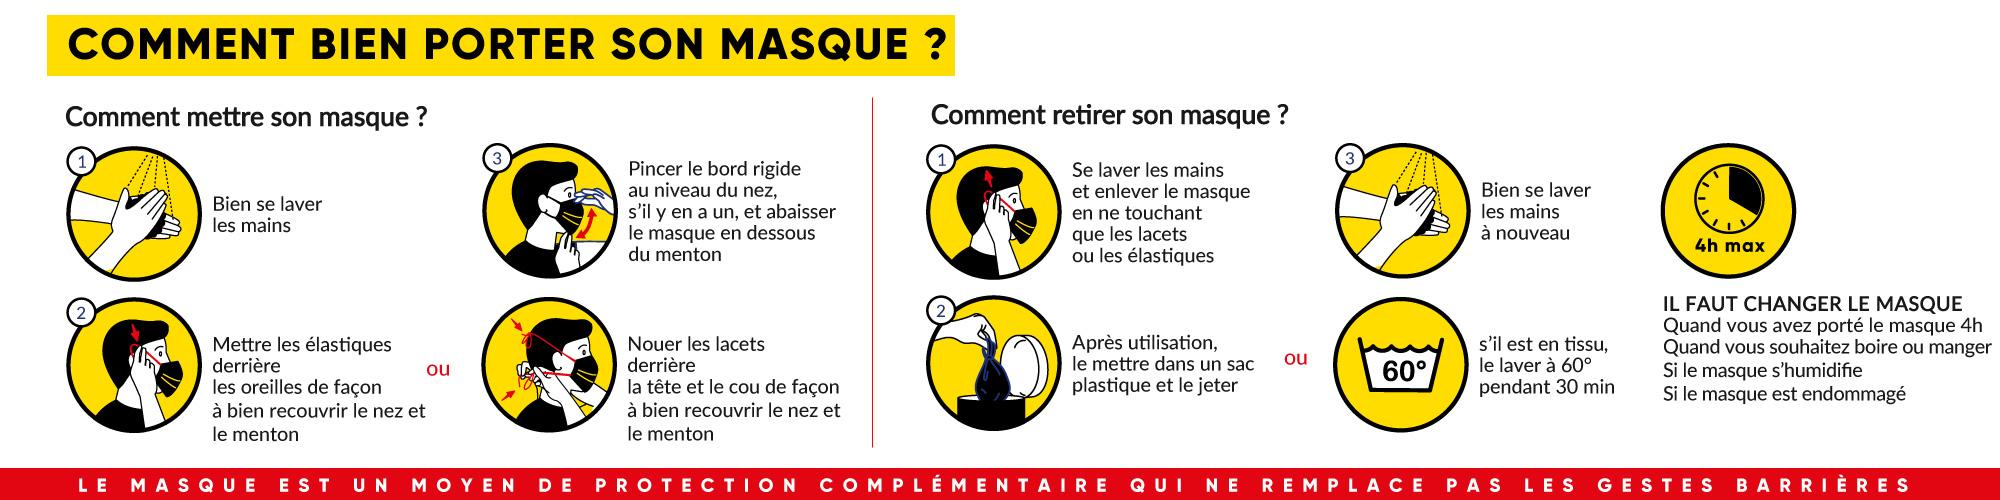 ./data/upload/Comment-bien-porter-son-masque_.jpg